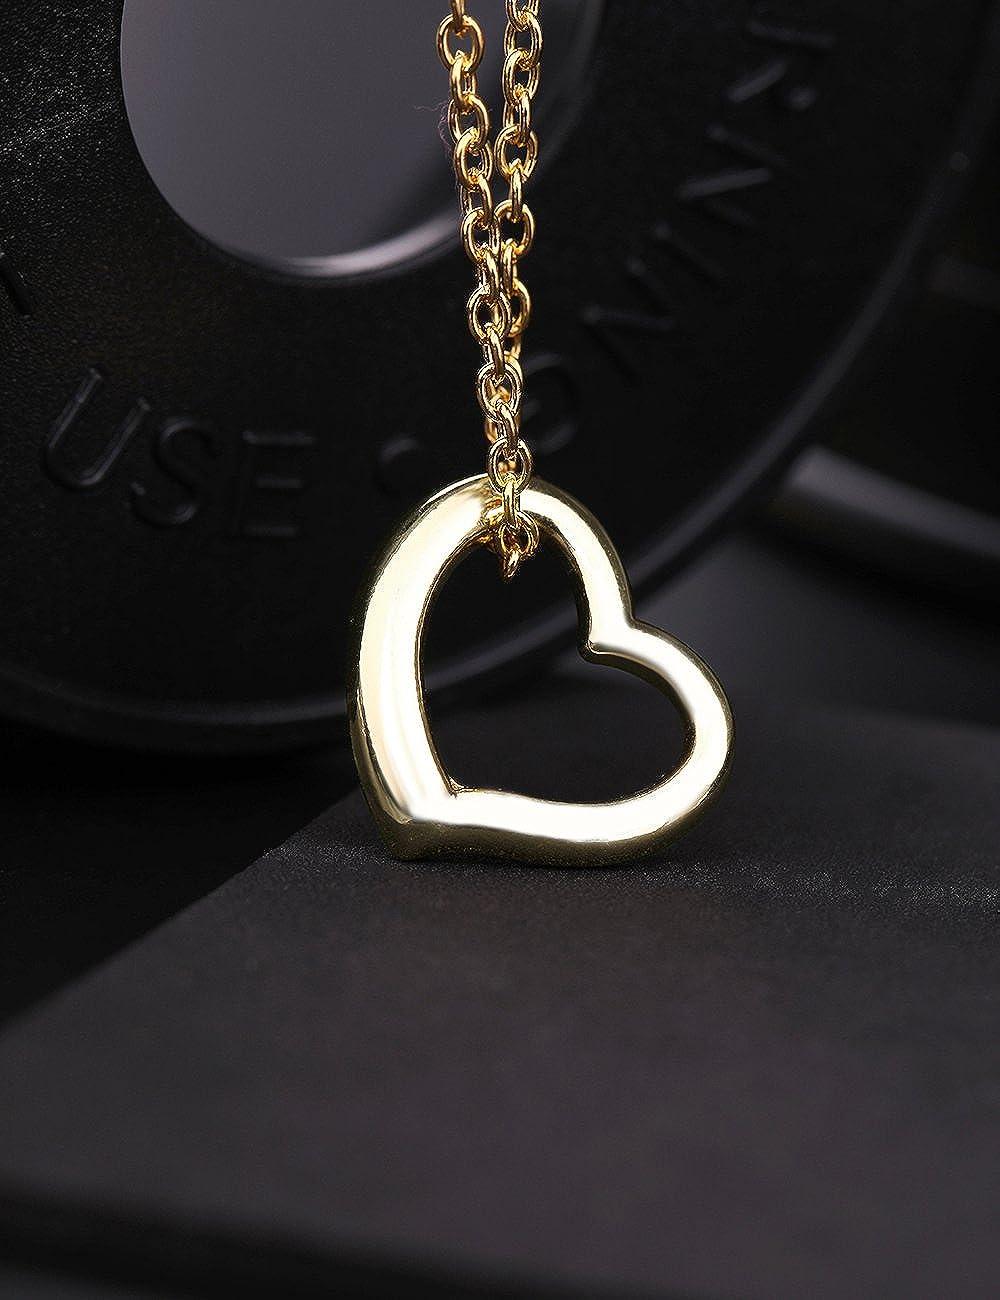 Fashion Simple Love Open Heart Shape Pendant Necklace Link Chain